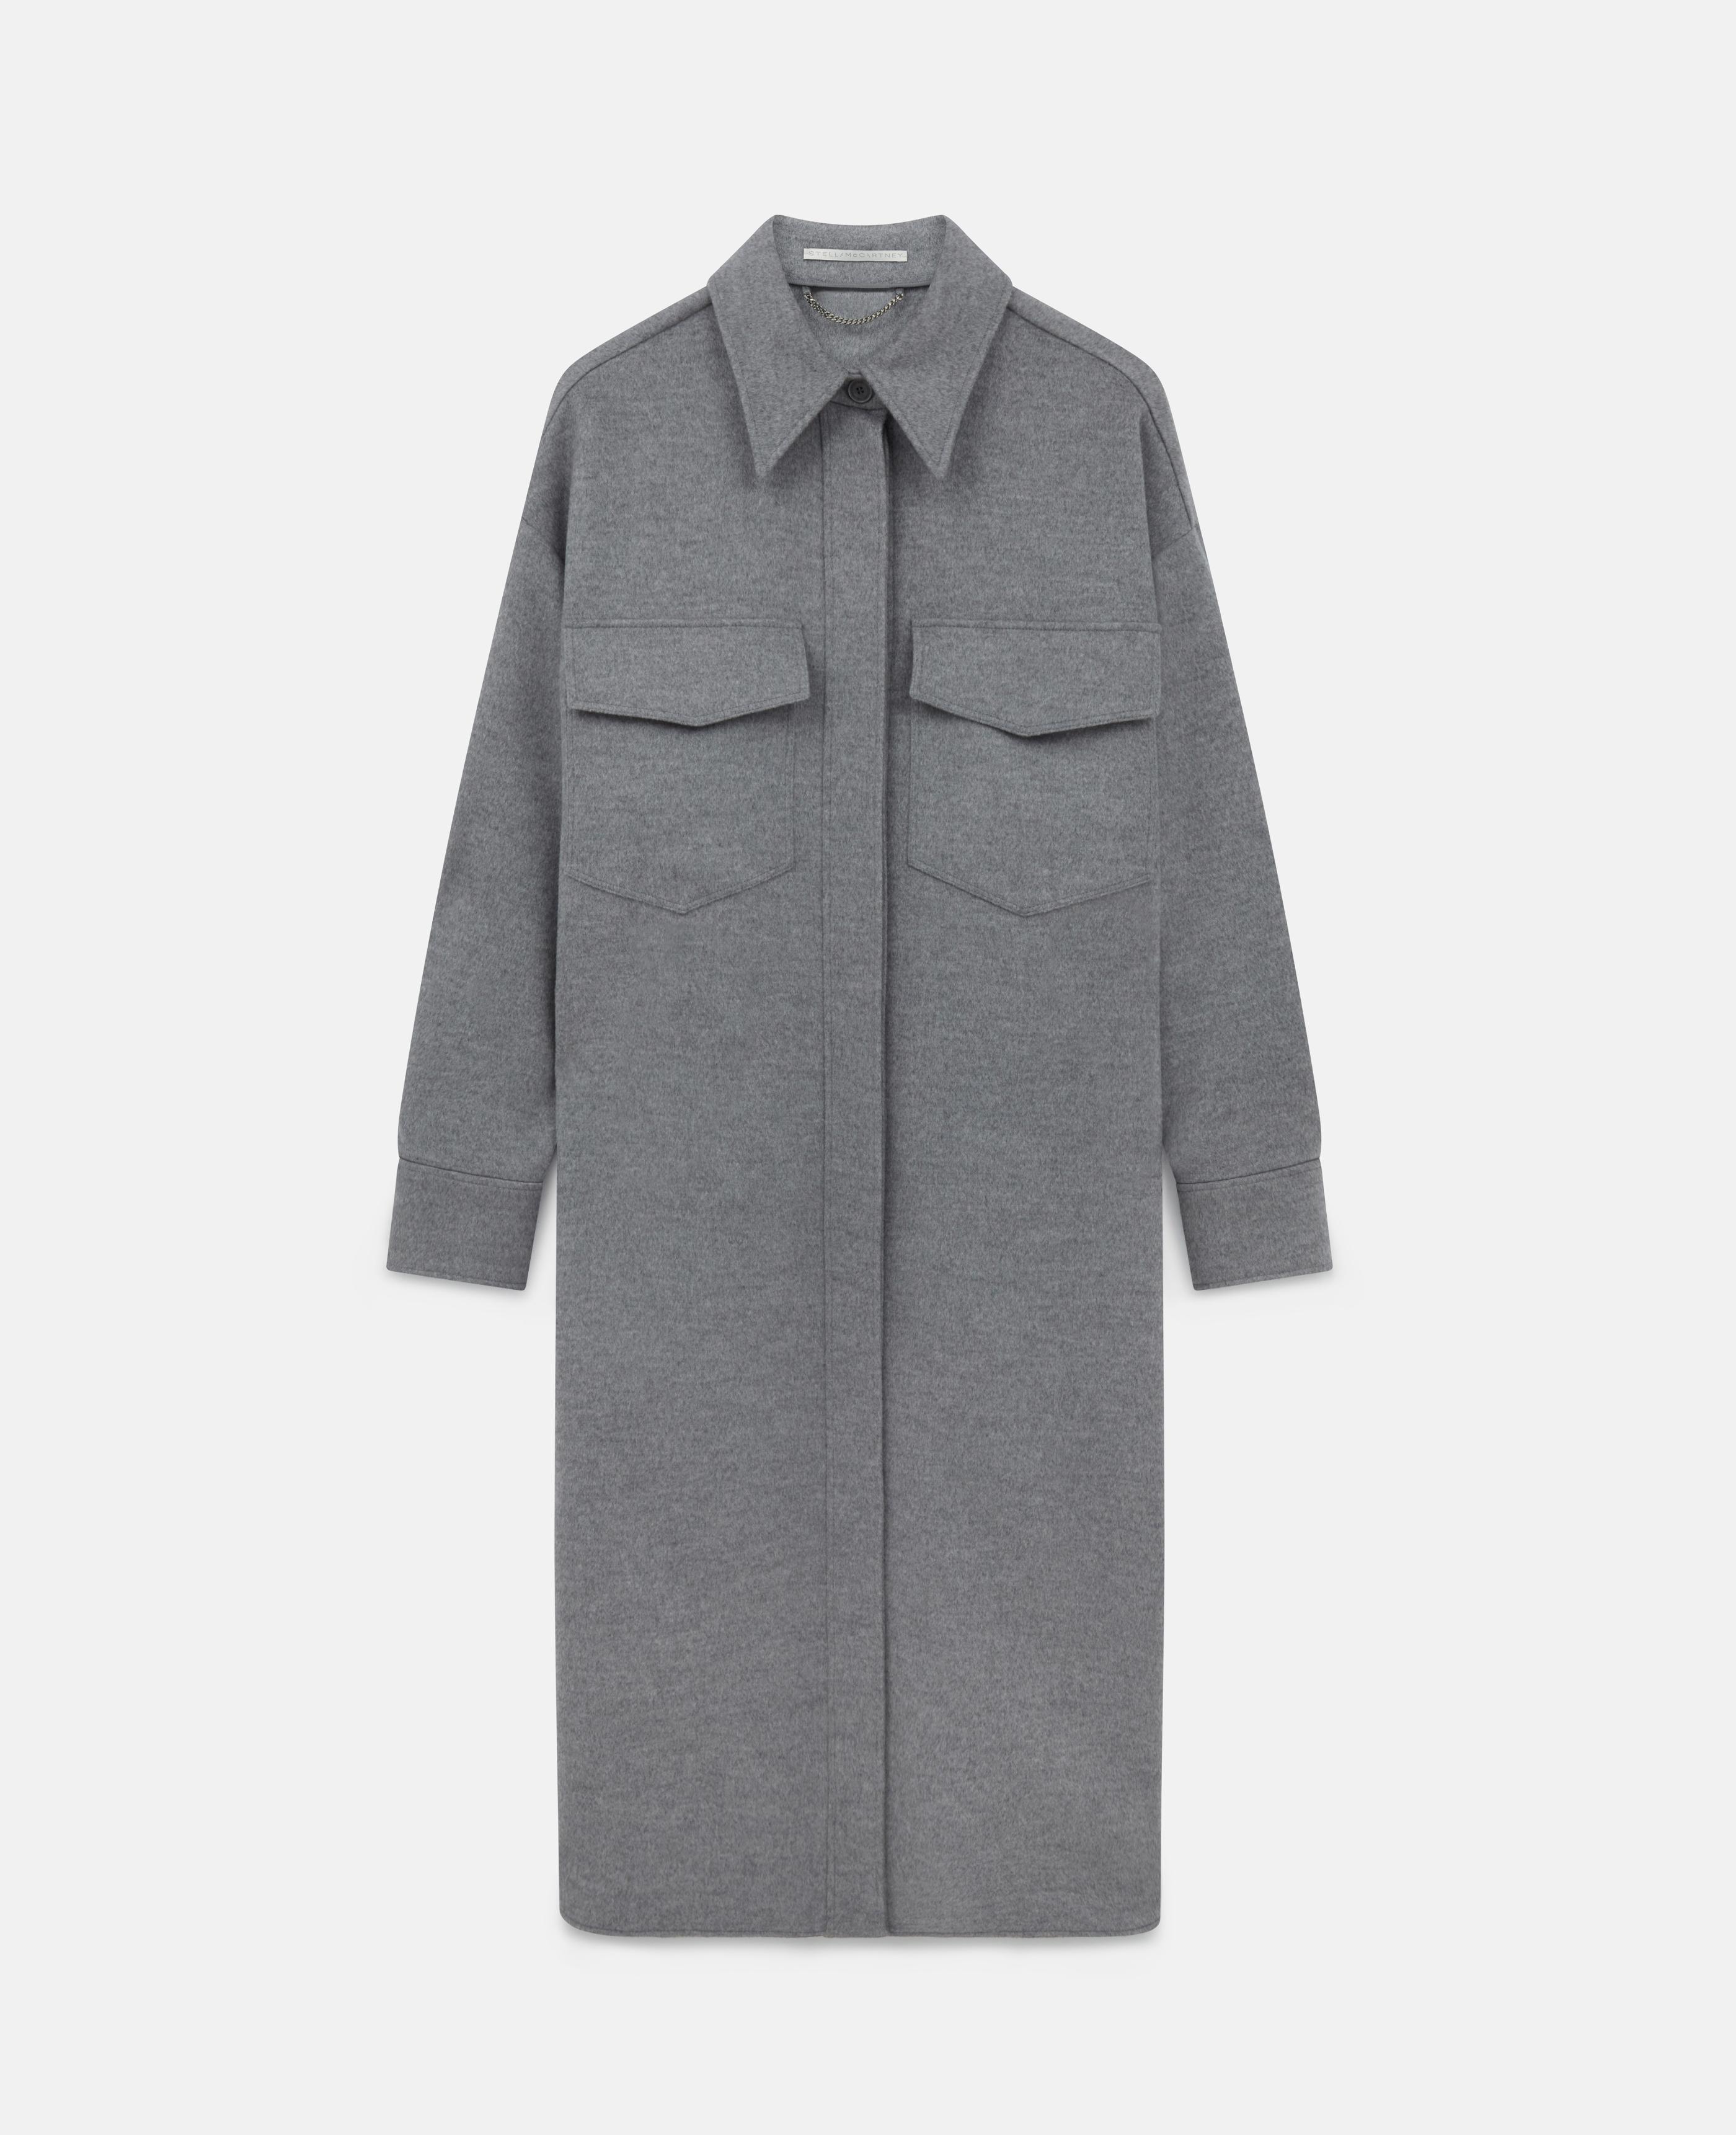 Stella McCartney - Manteau en laine Linda, Femme, Light Grey Melange, Taille: 40